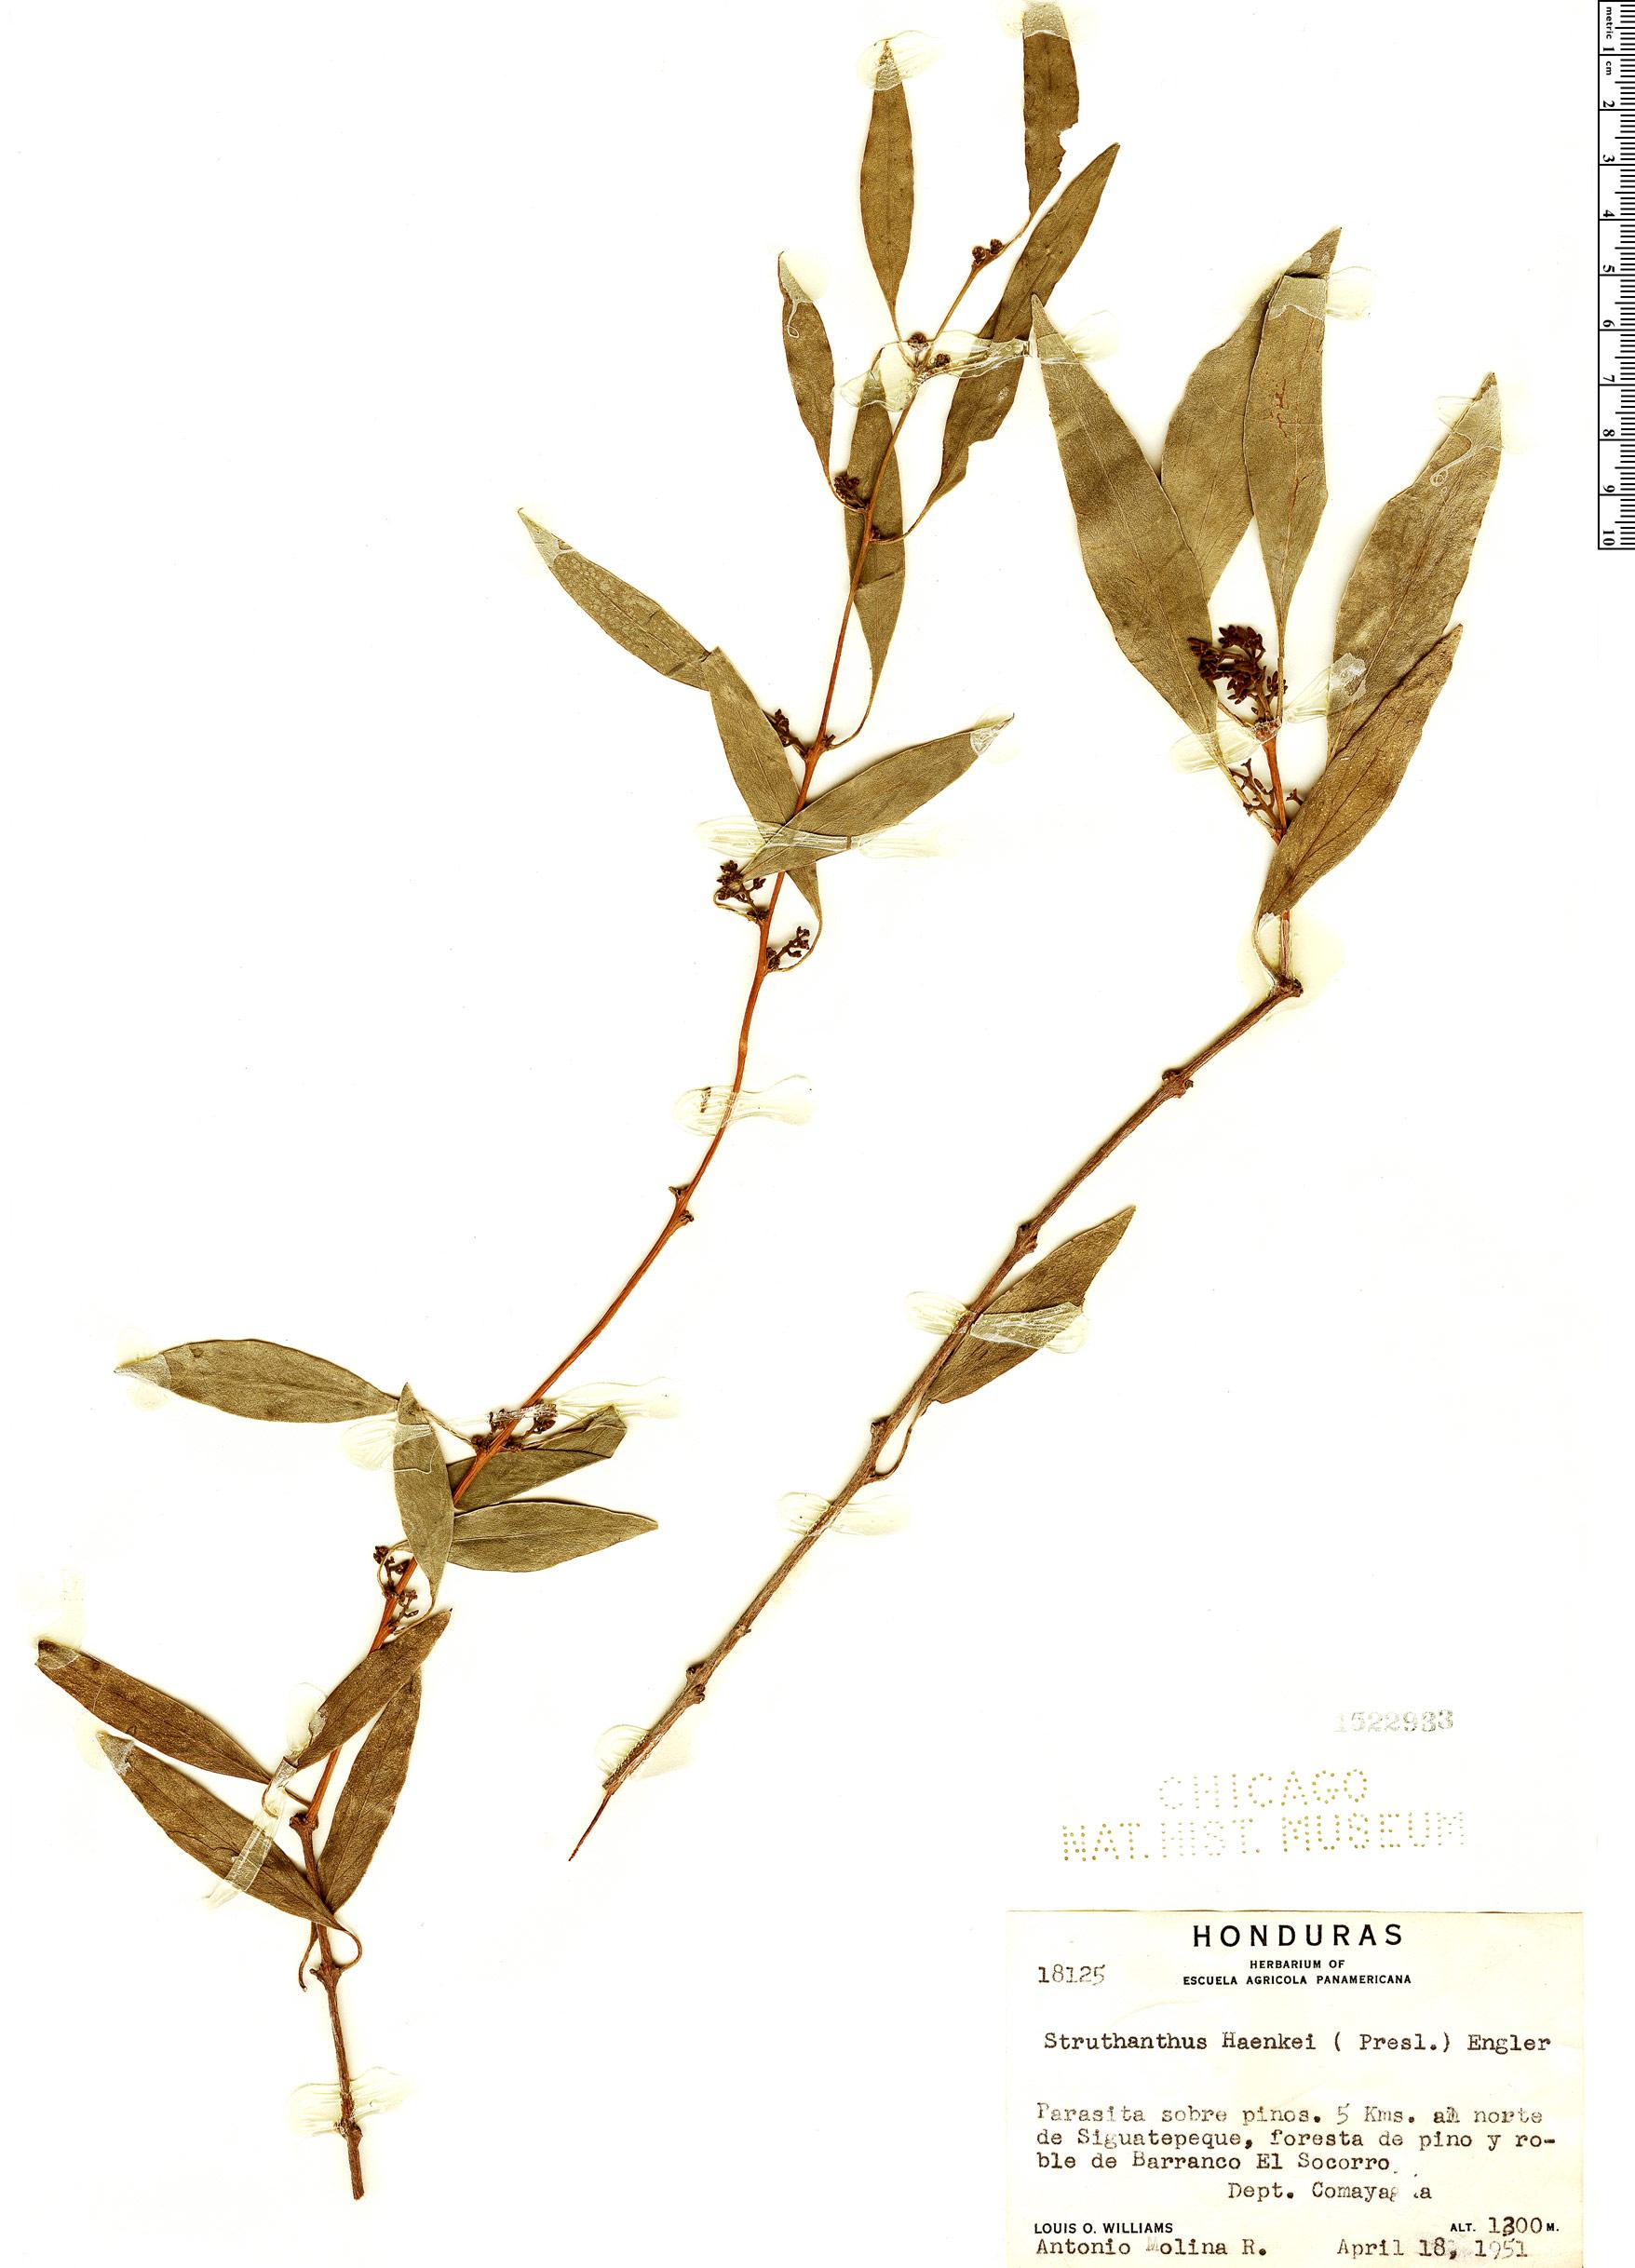 Specimen: Struthanthus haenkei